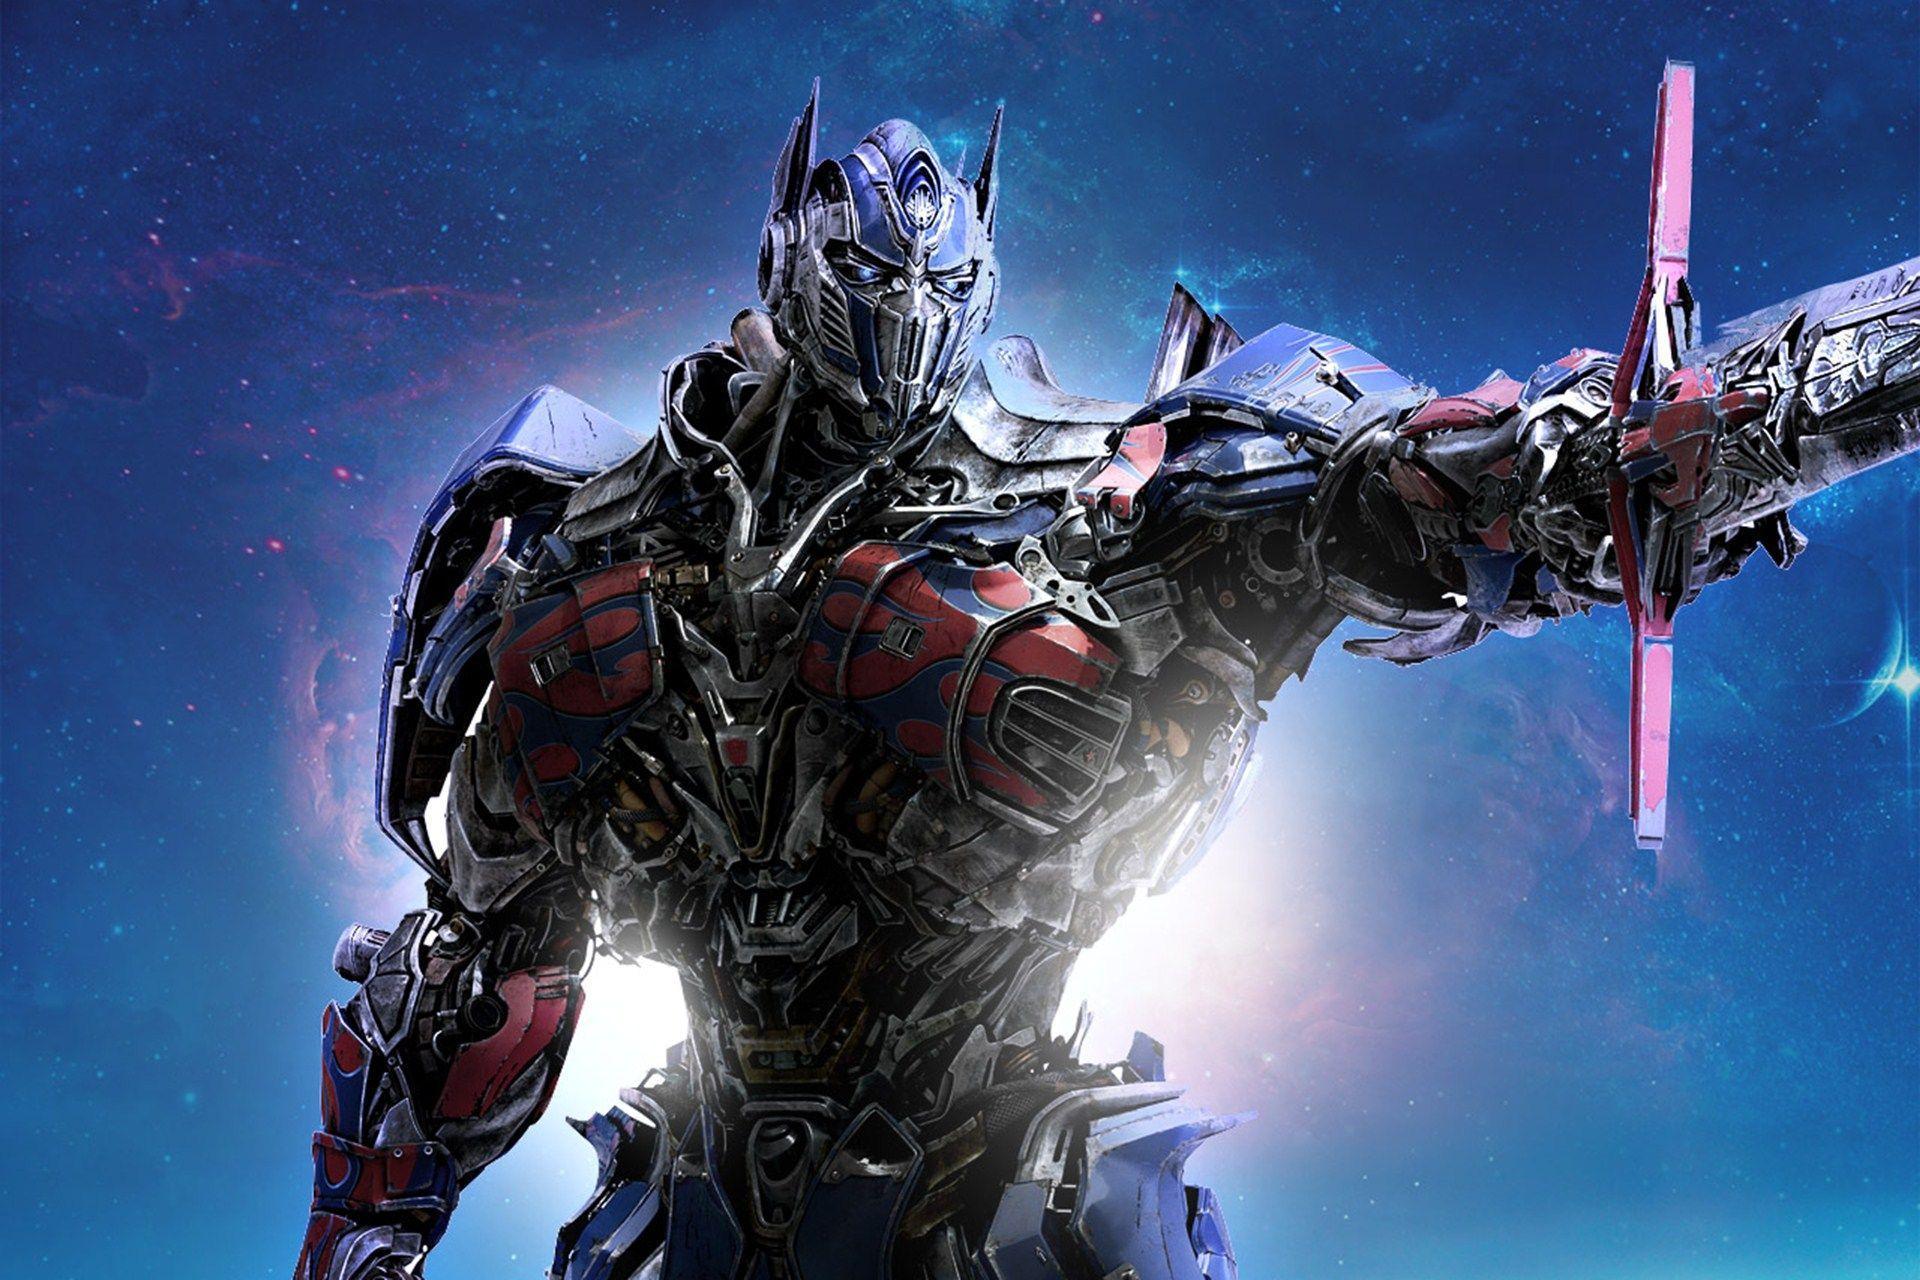 transformers wallpaper widescreen -#main